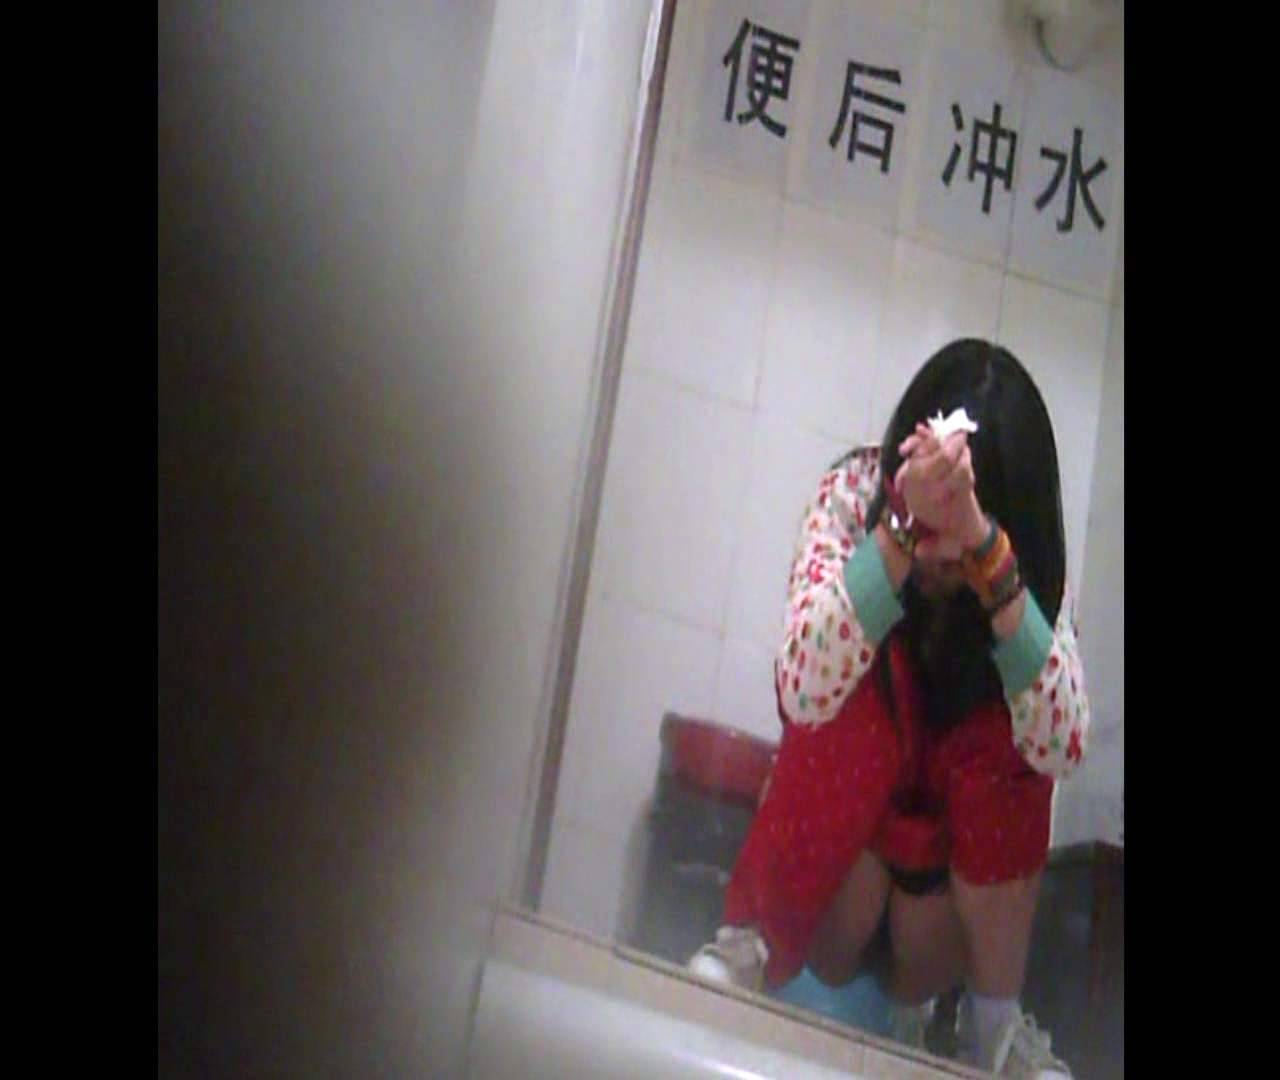 Vol.01 赤のパンツスタイルがとっても眩しい!! パンツ特集 AV無料動画キャプチャ 61画像 44